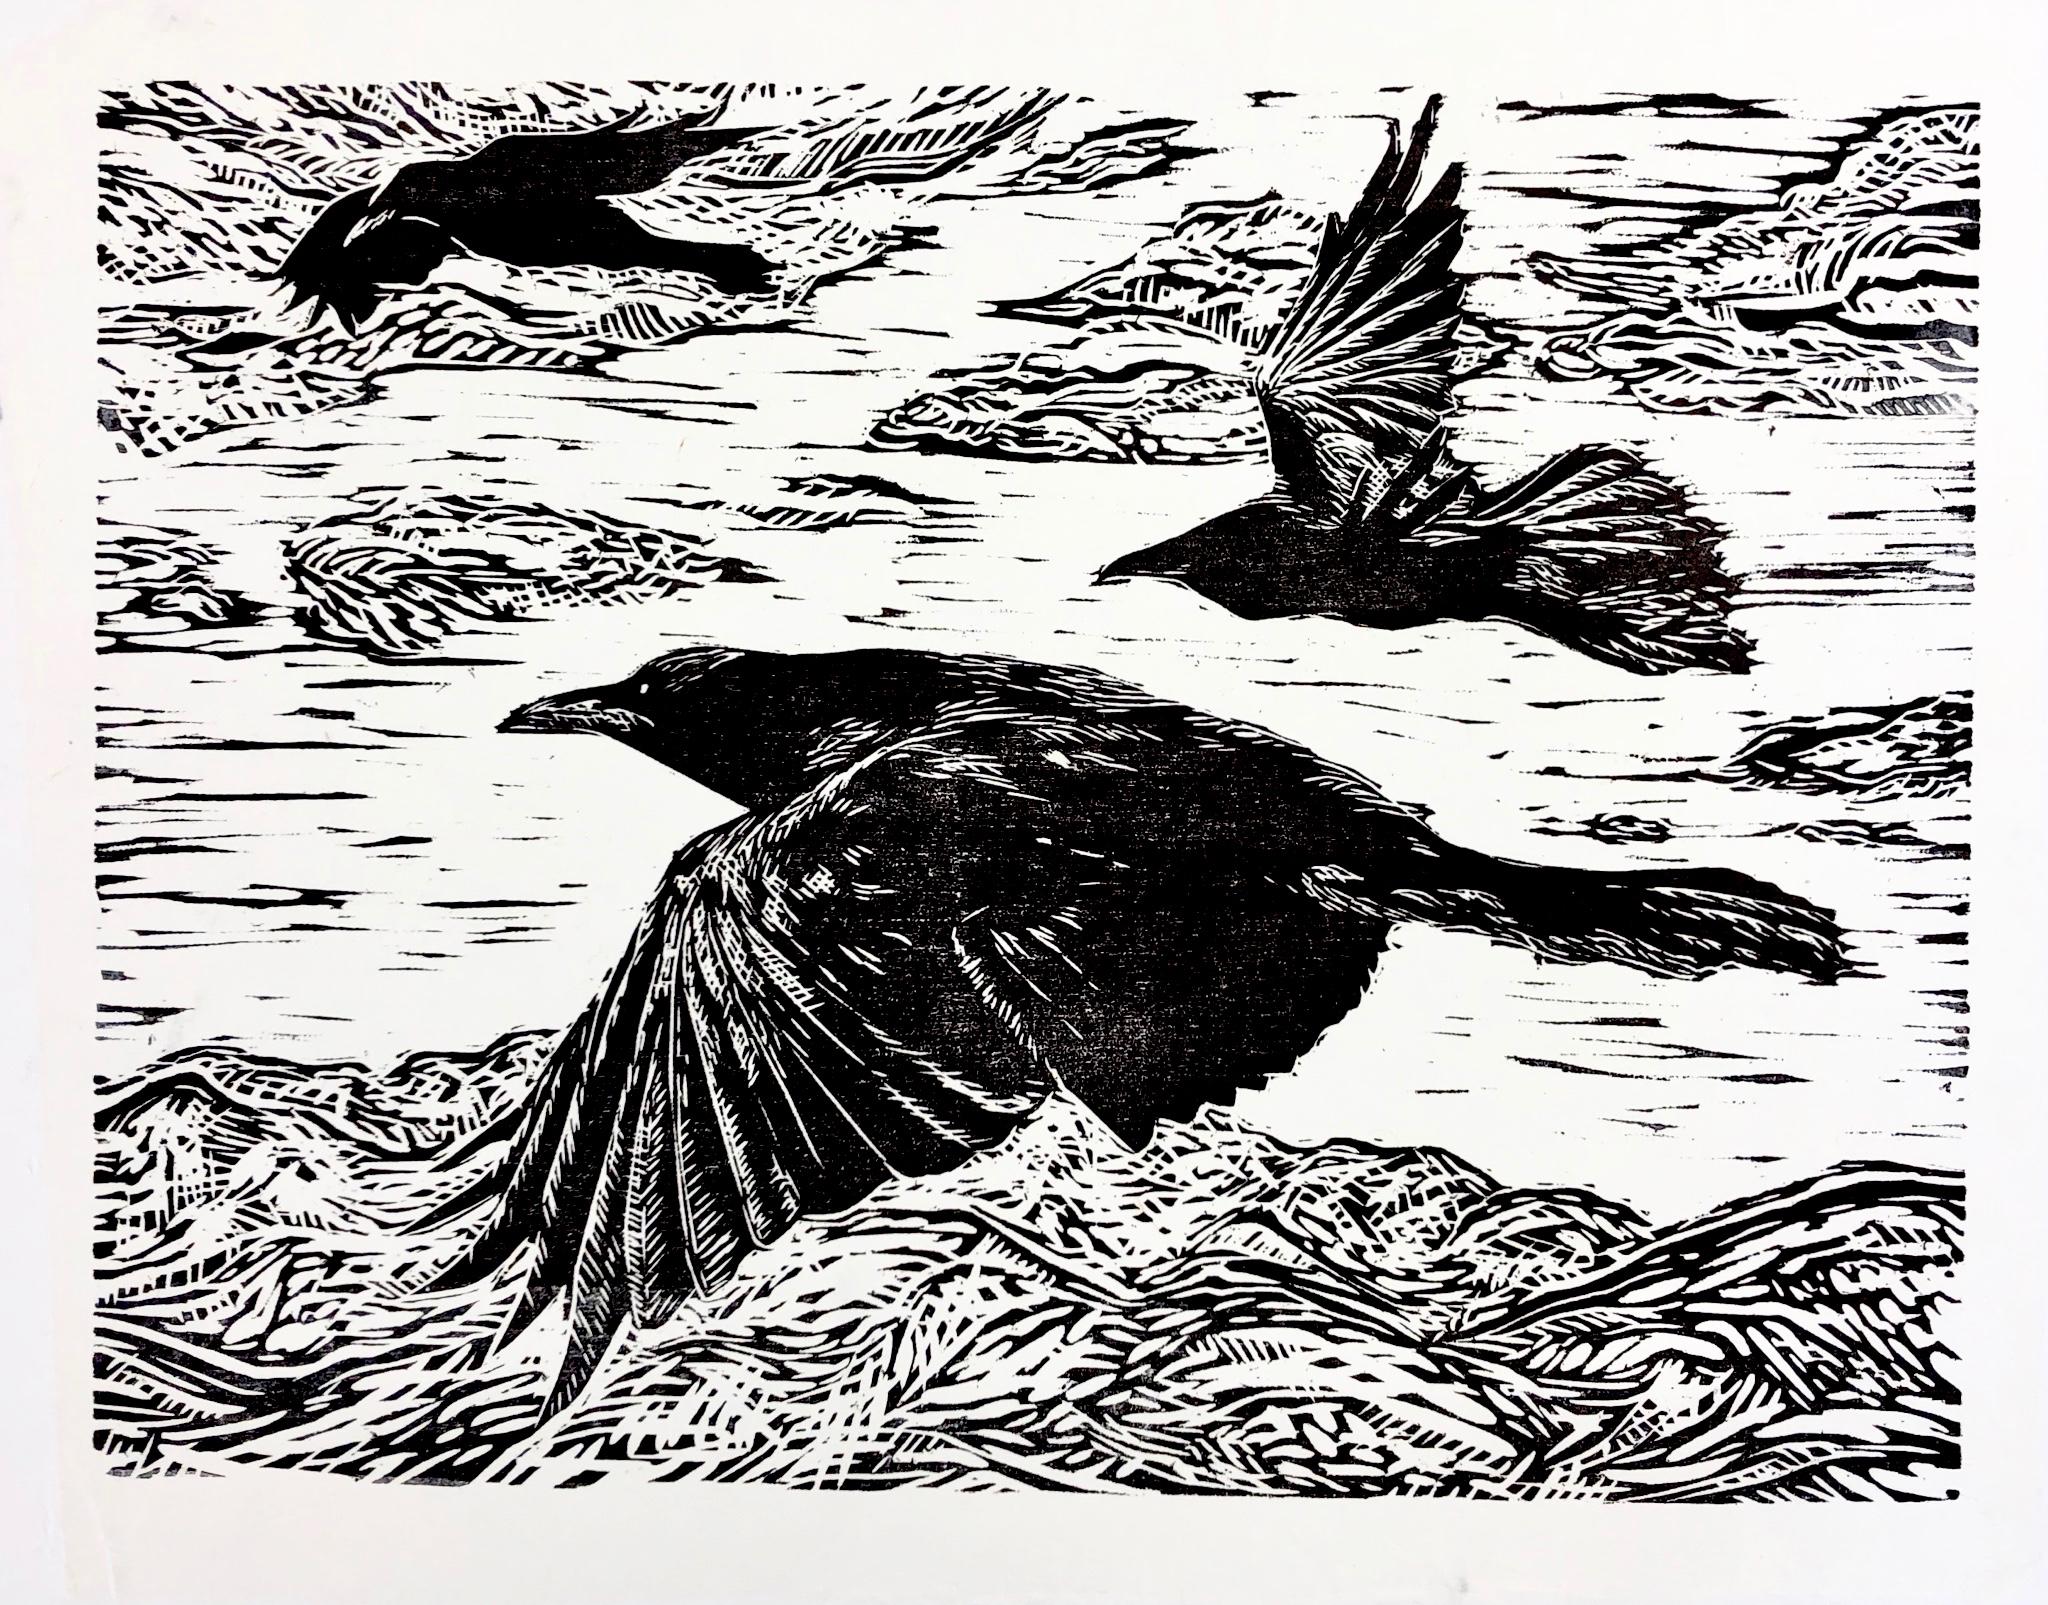 Flight of the Raven - Grand Staircase Escalante - woodcut print